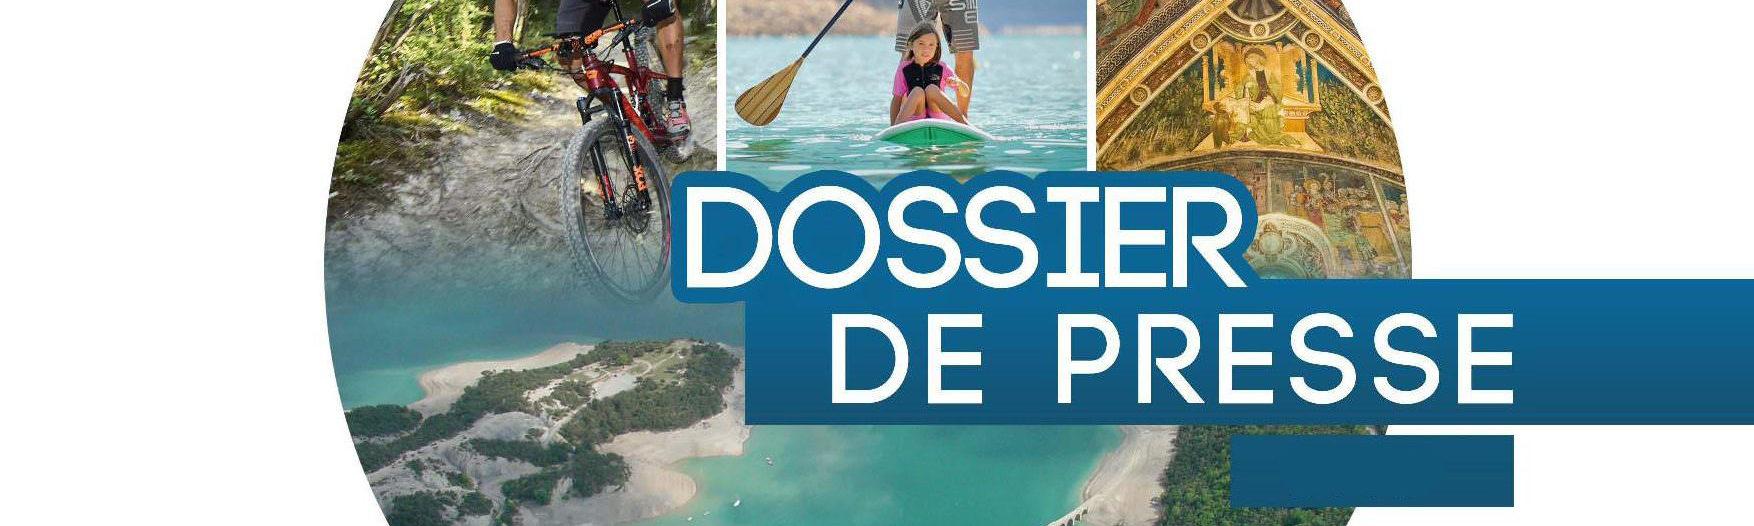 Dossier presse Serre-Ponçon